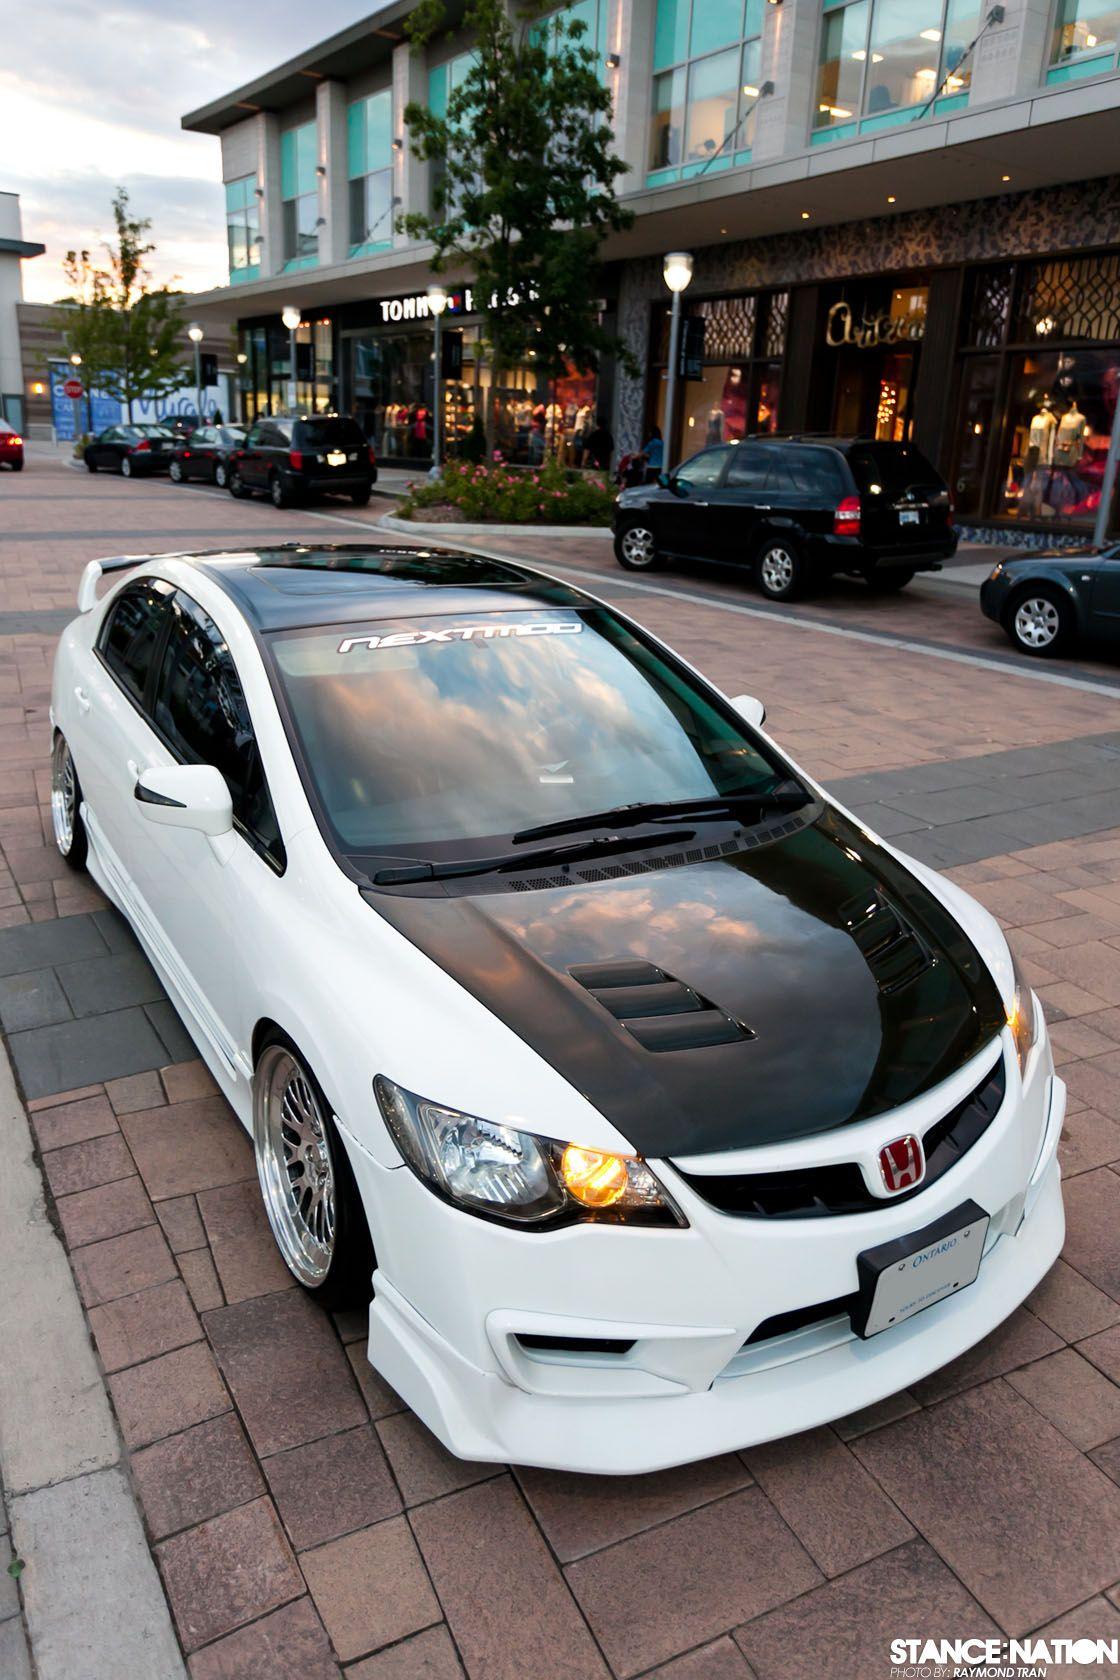 Honda Civic 2014 Modified : honda, civic, modified, Properly, Reppin', Toronto!, StanceNation™, Function, Honda, Civic, Civic,